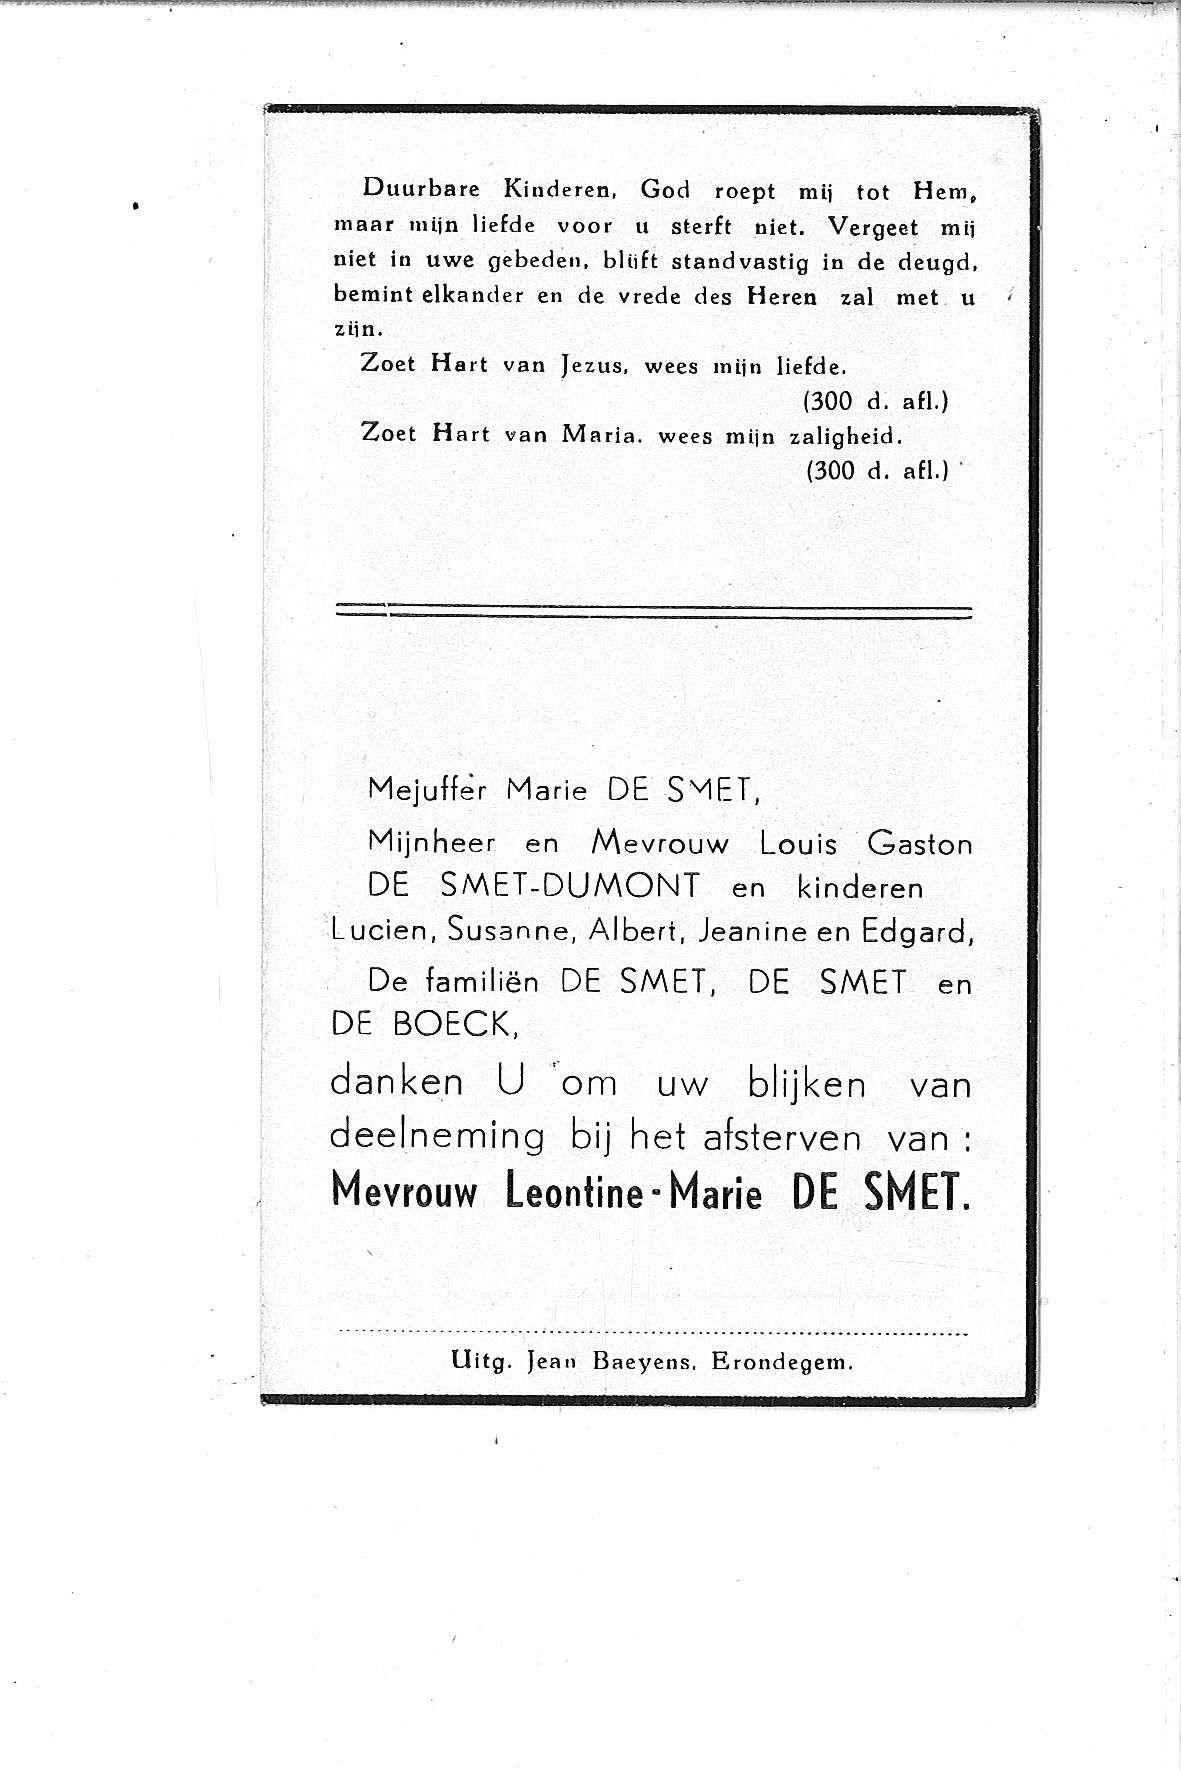 Leontine-Marie (1948) 20120424103450_00113.jpg